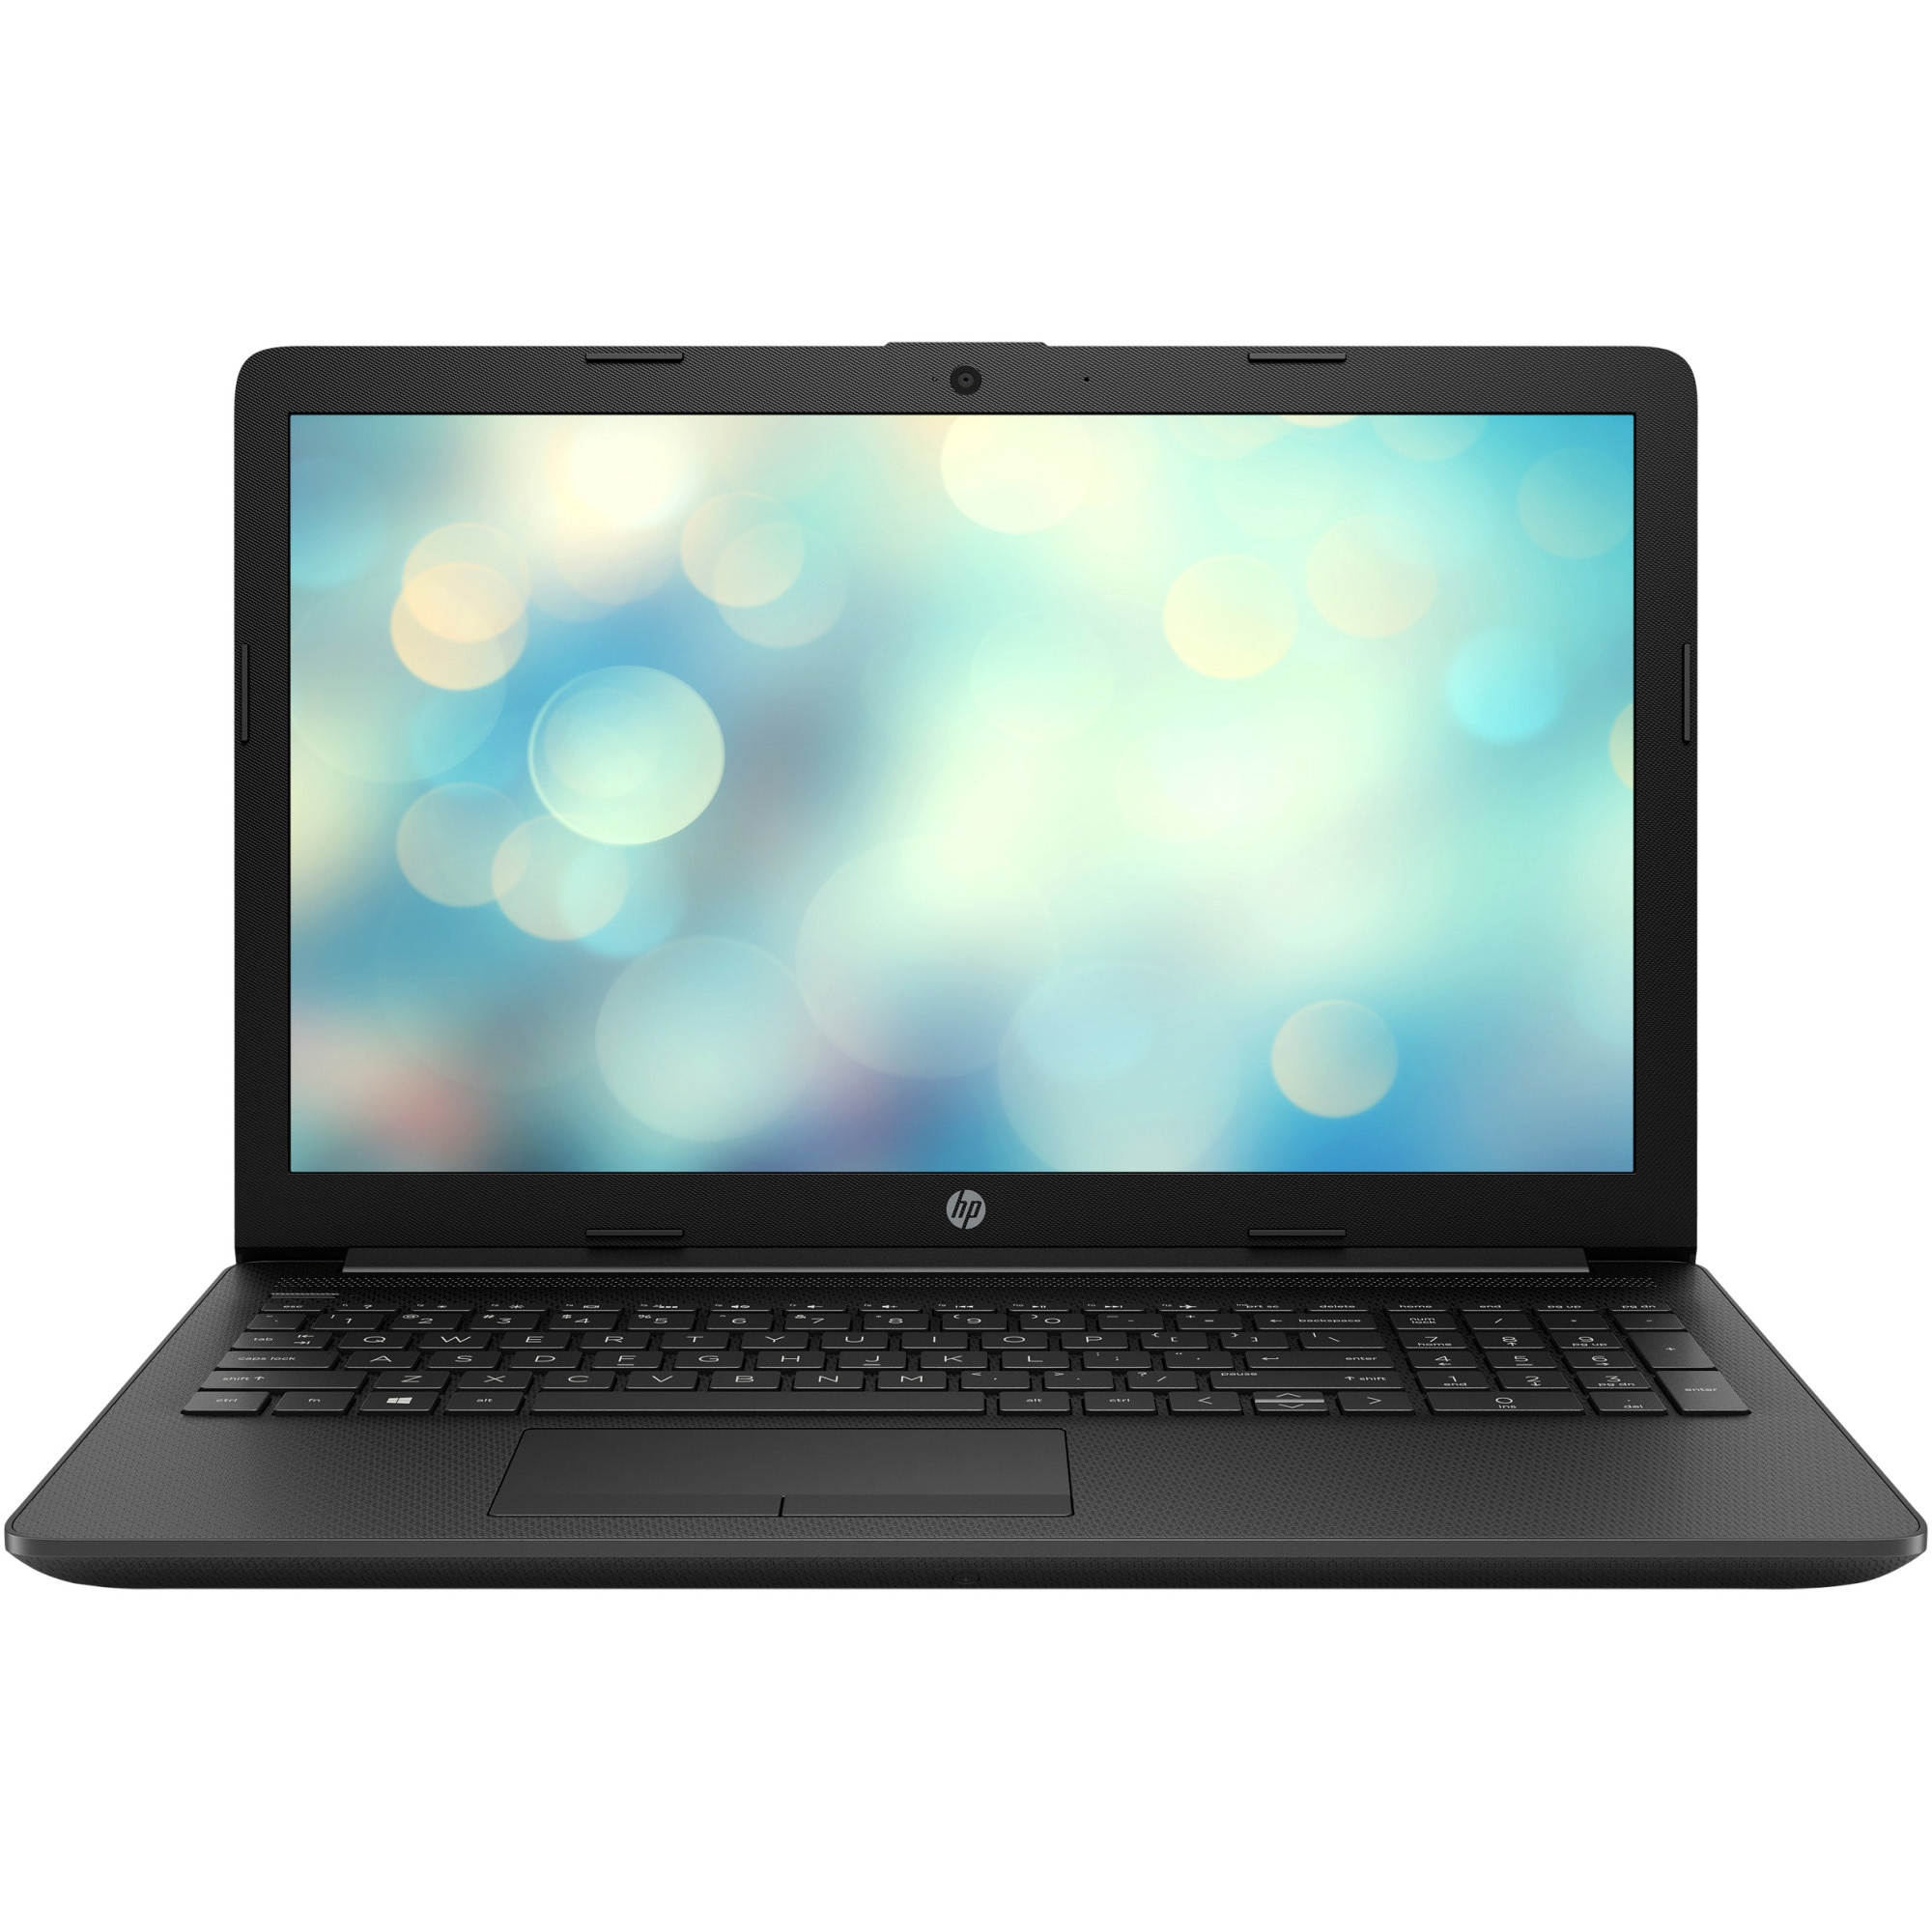 "Fotografie Laptop HP 15-db1100ny cu procesor AMD Ryzen 5 3500U pana la 3.70 GHz, 15.6"", Full HD, 4GB, 1TB HDD, AMD Radeon Vega 8, Free DOS, Black"